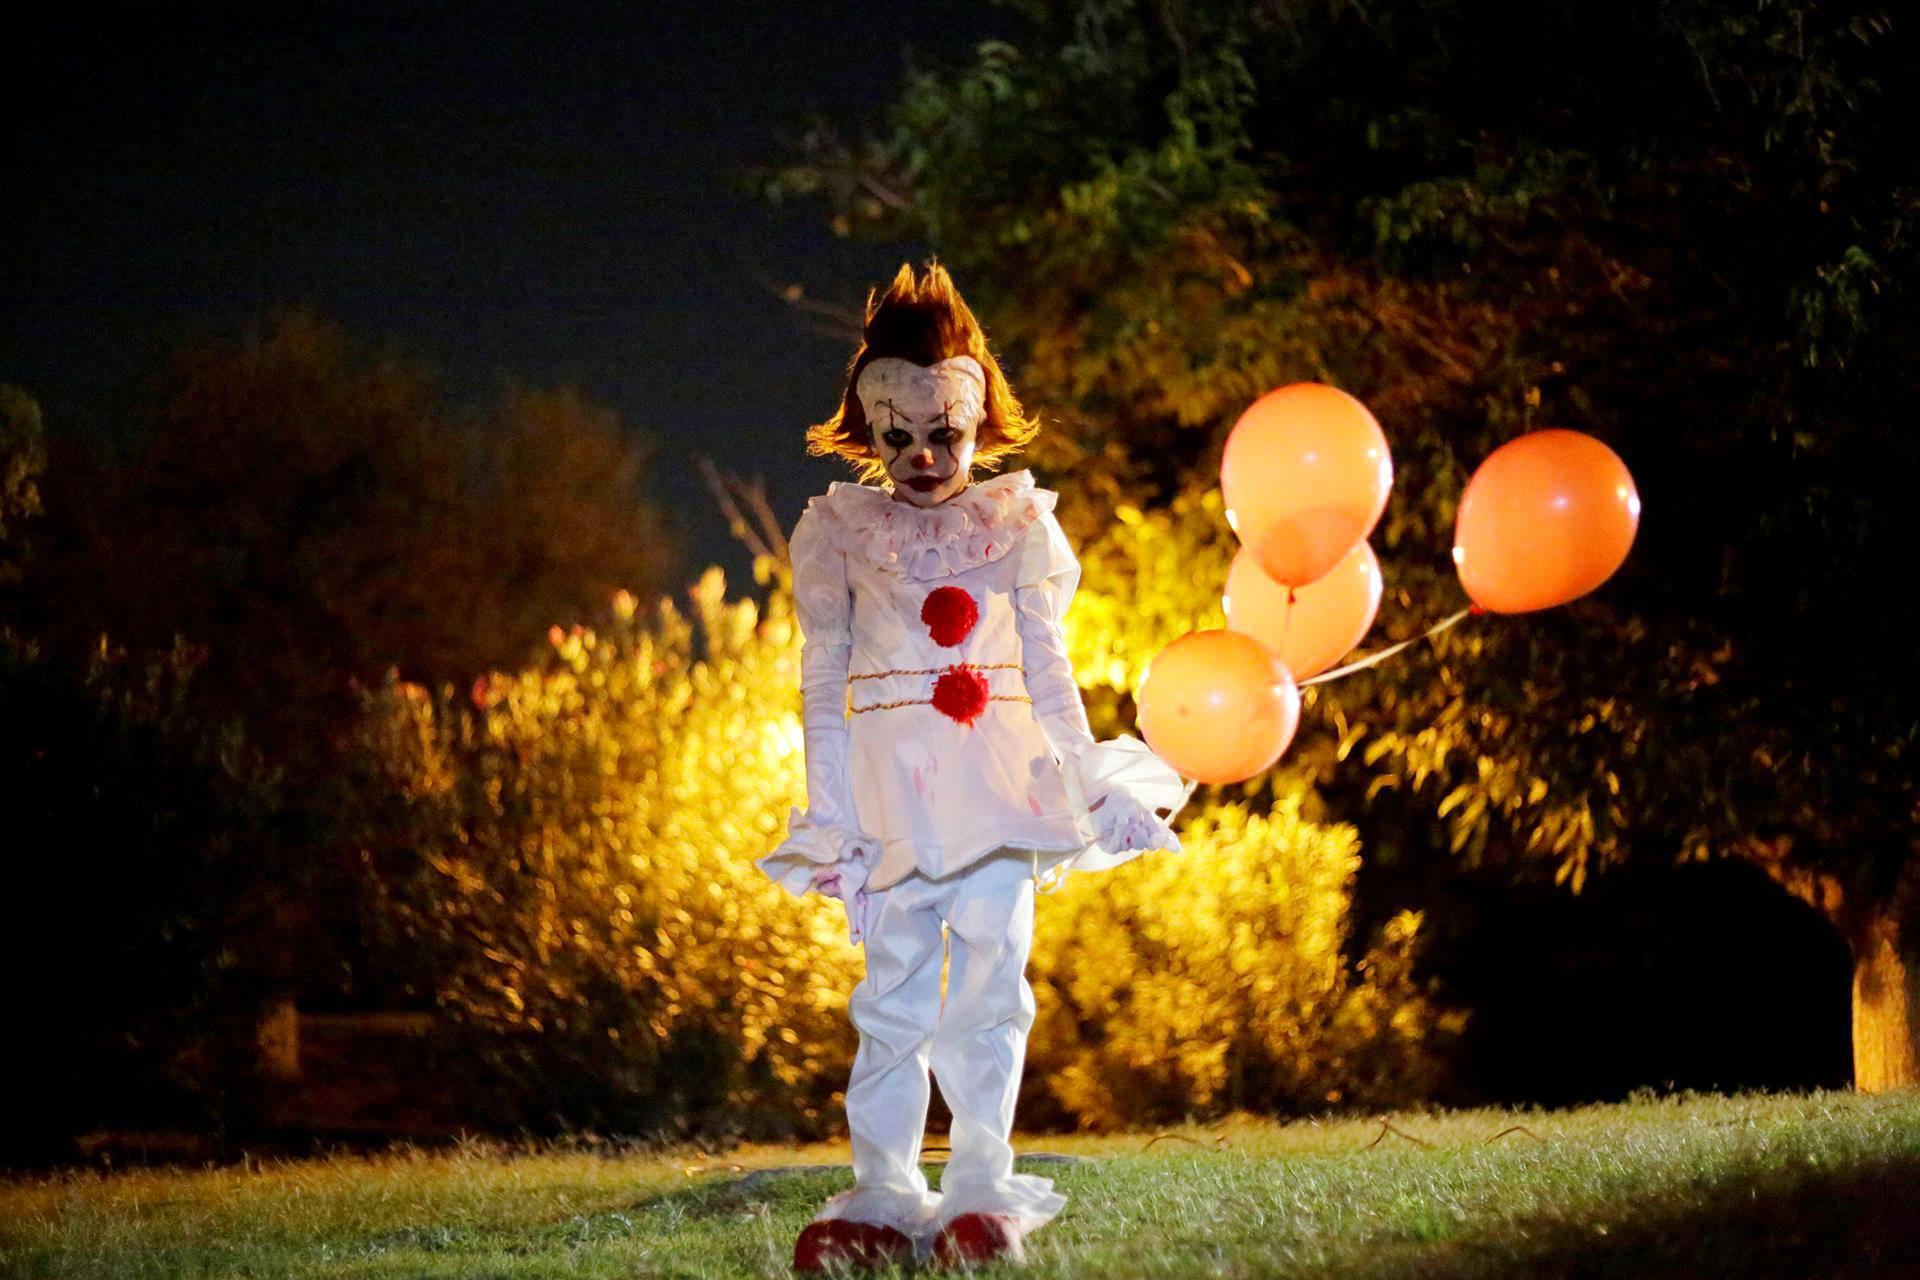 Se-kauhuelokuvan Pennywise-klovniksi pukeutunut lapsi Ciudad Juarezissa Meksikossa.